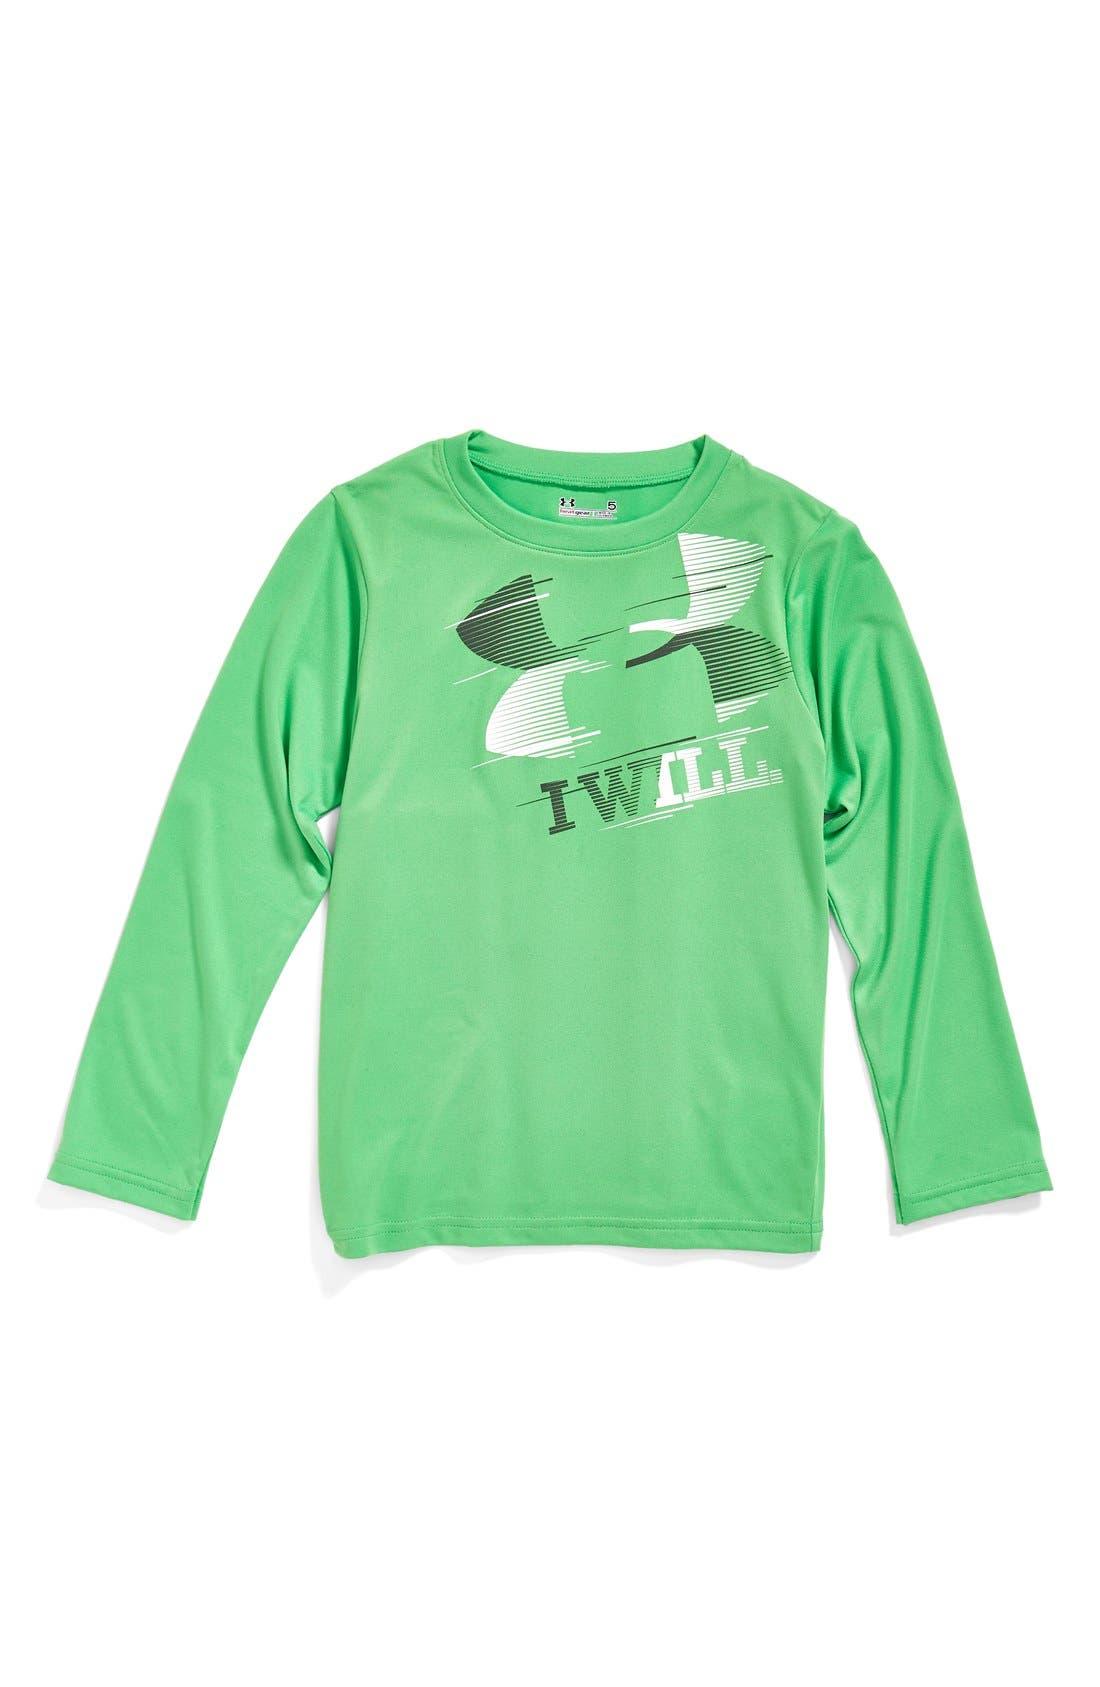 Main Image - Under Armour 'I Will' HeatGear® Long Sleeve T-Shirt (Toddler Boys & Little Boys)